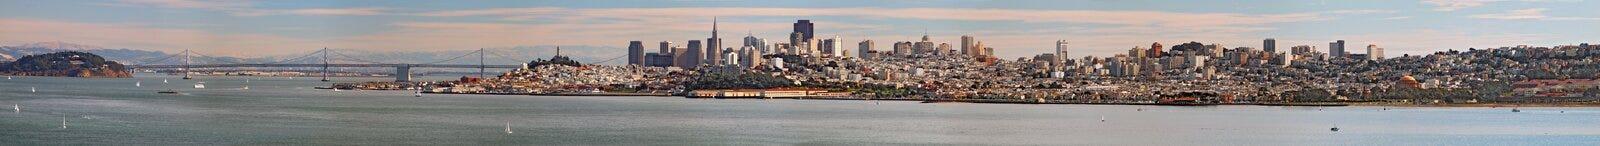 Francisco-Panorama Stockfotografie